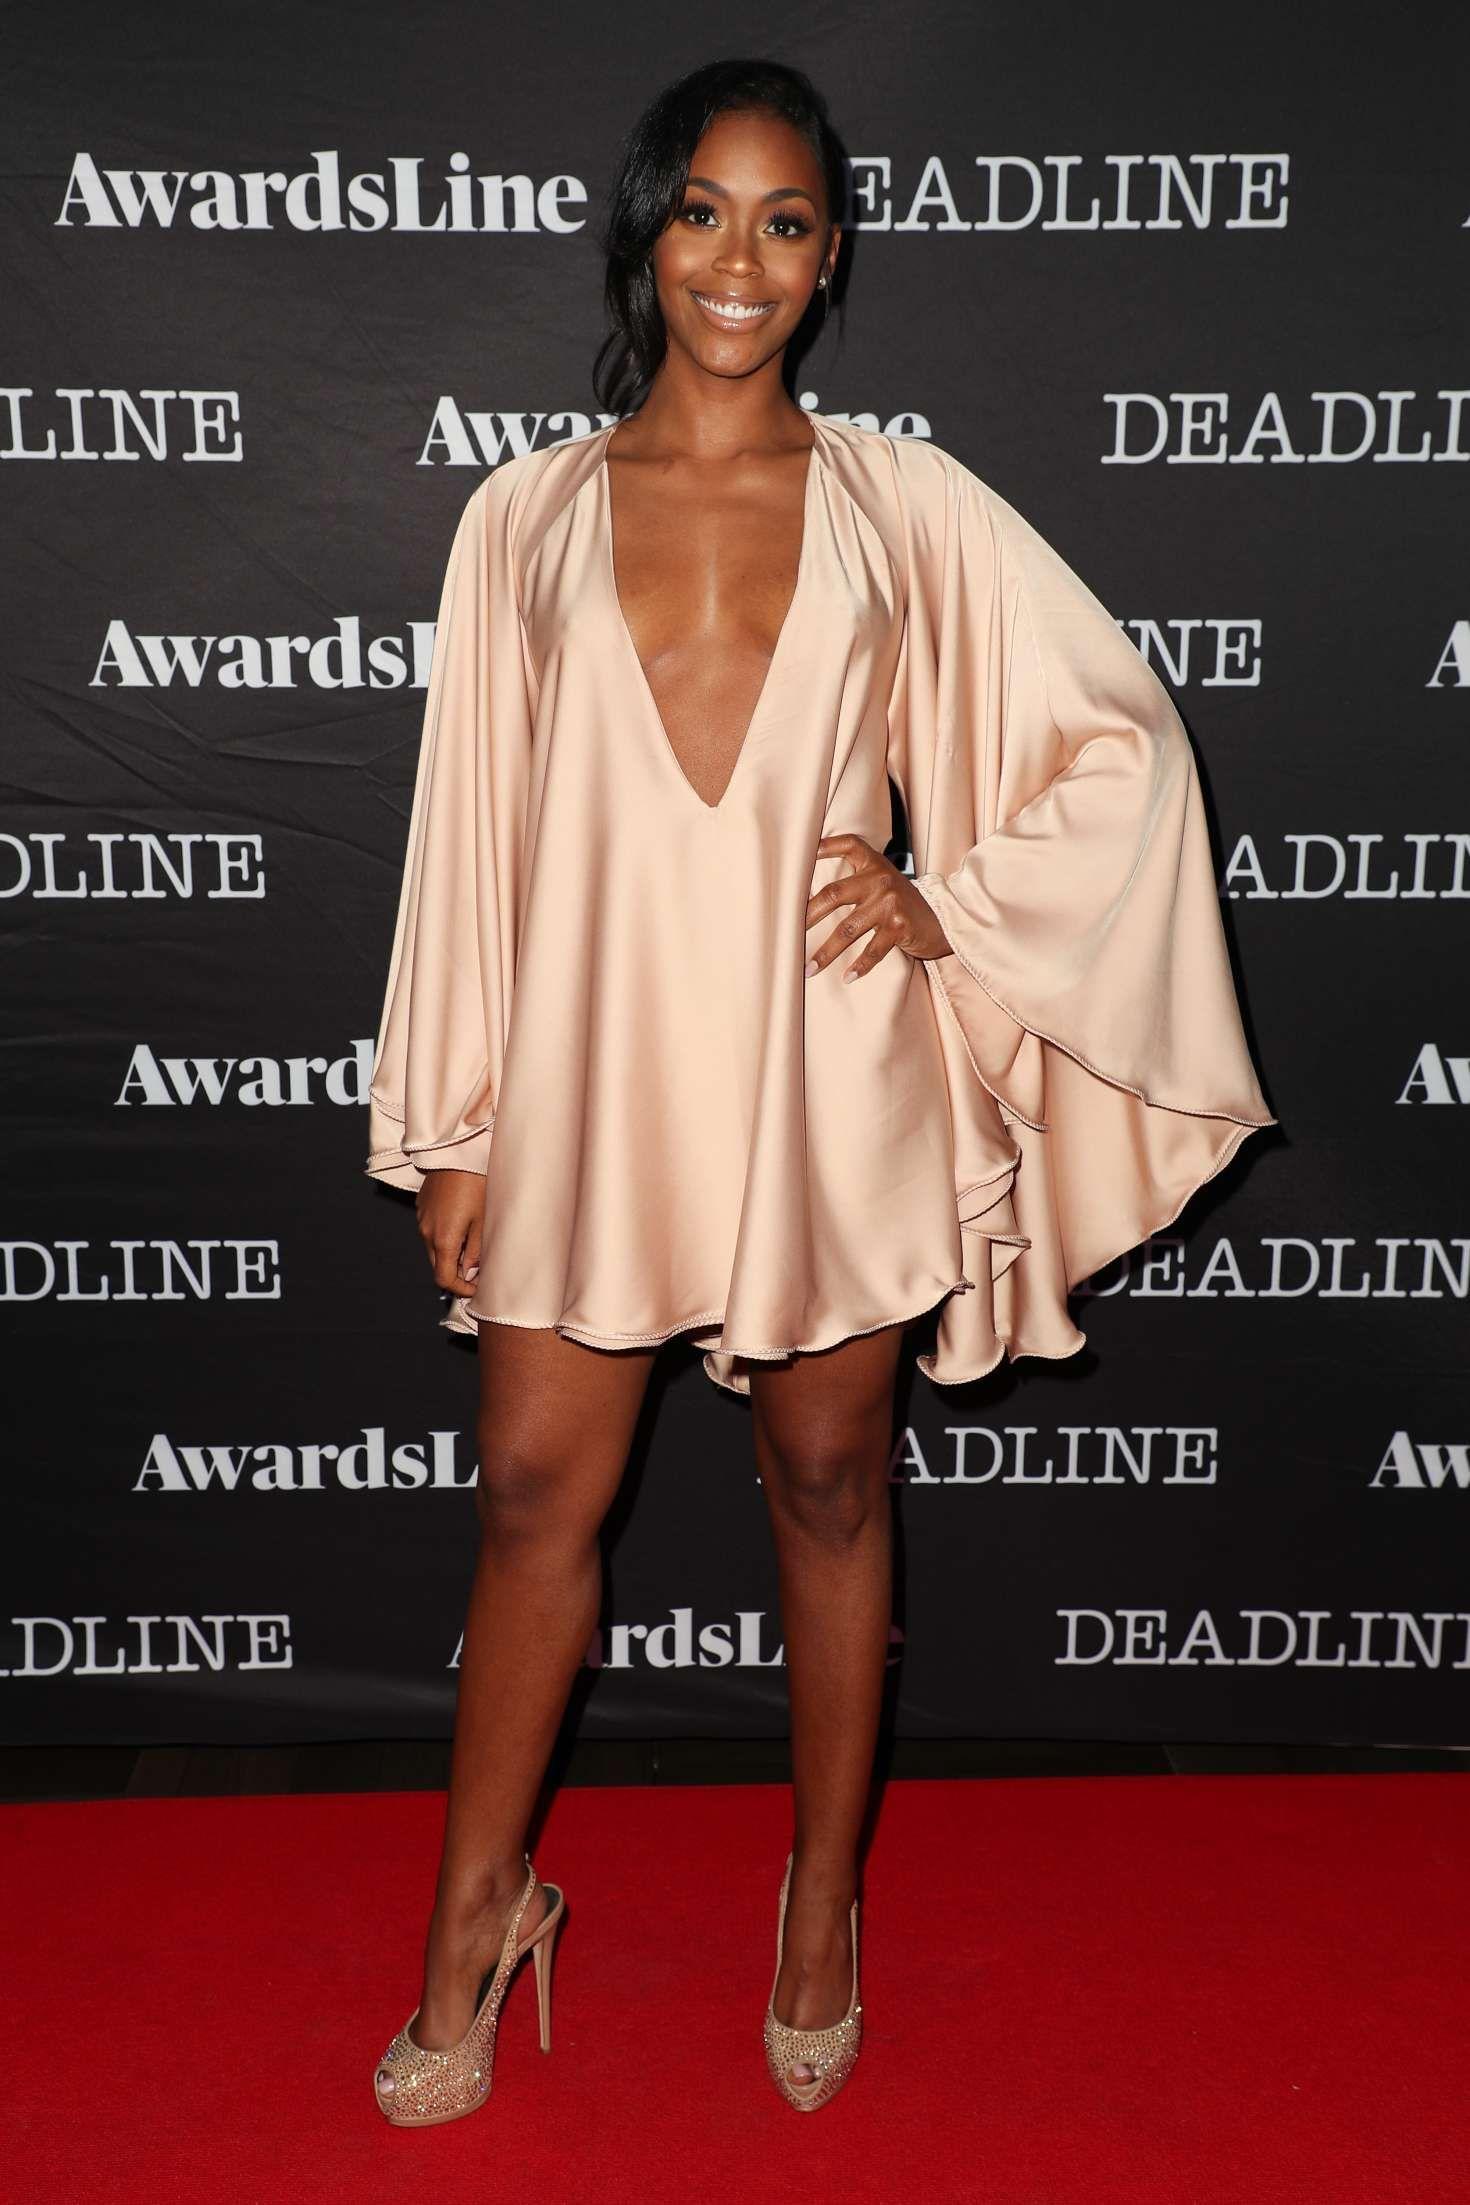 Paparazzi Nafessa Williams nude (73 photo), Topless, Leaked, Feet, cleavage 2019